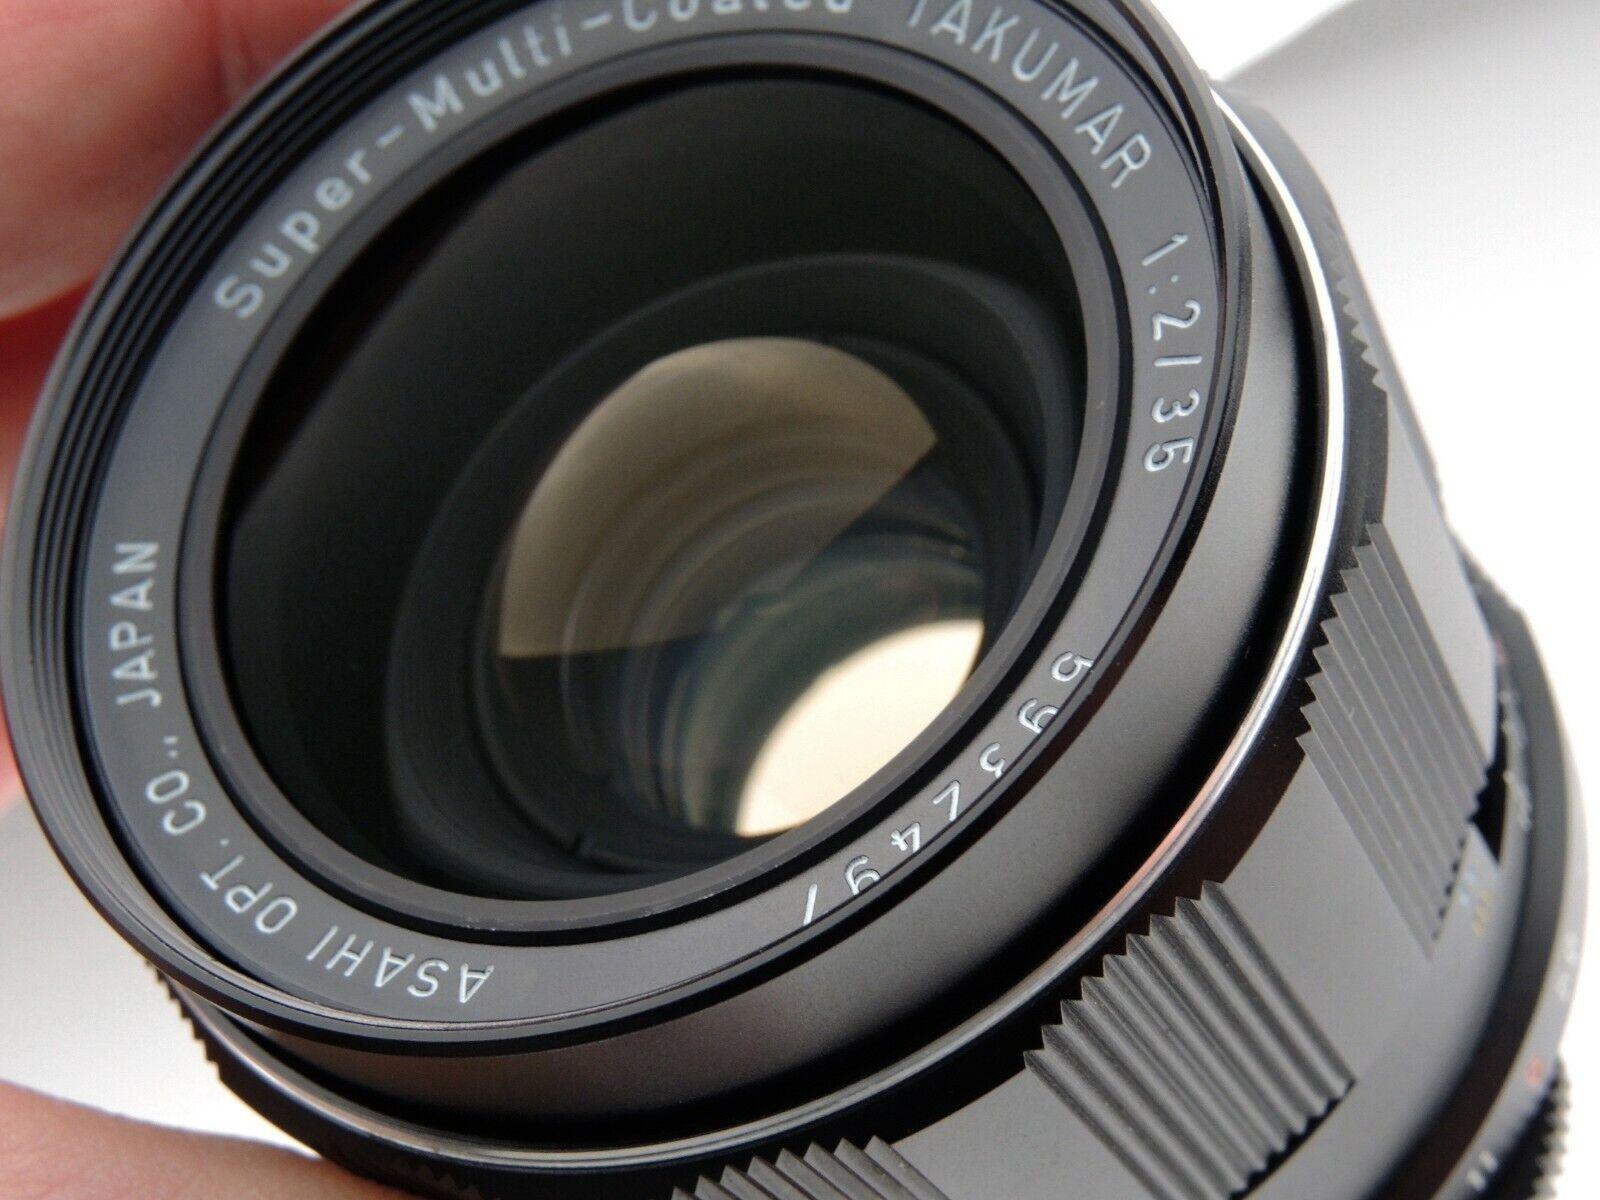 ASAHI PENTAX 35mm F2 SMC SUPER MULTI COATED TAKUMAR LENS NEAR MINT M42 MOUNT - $239.99